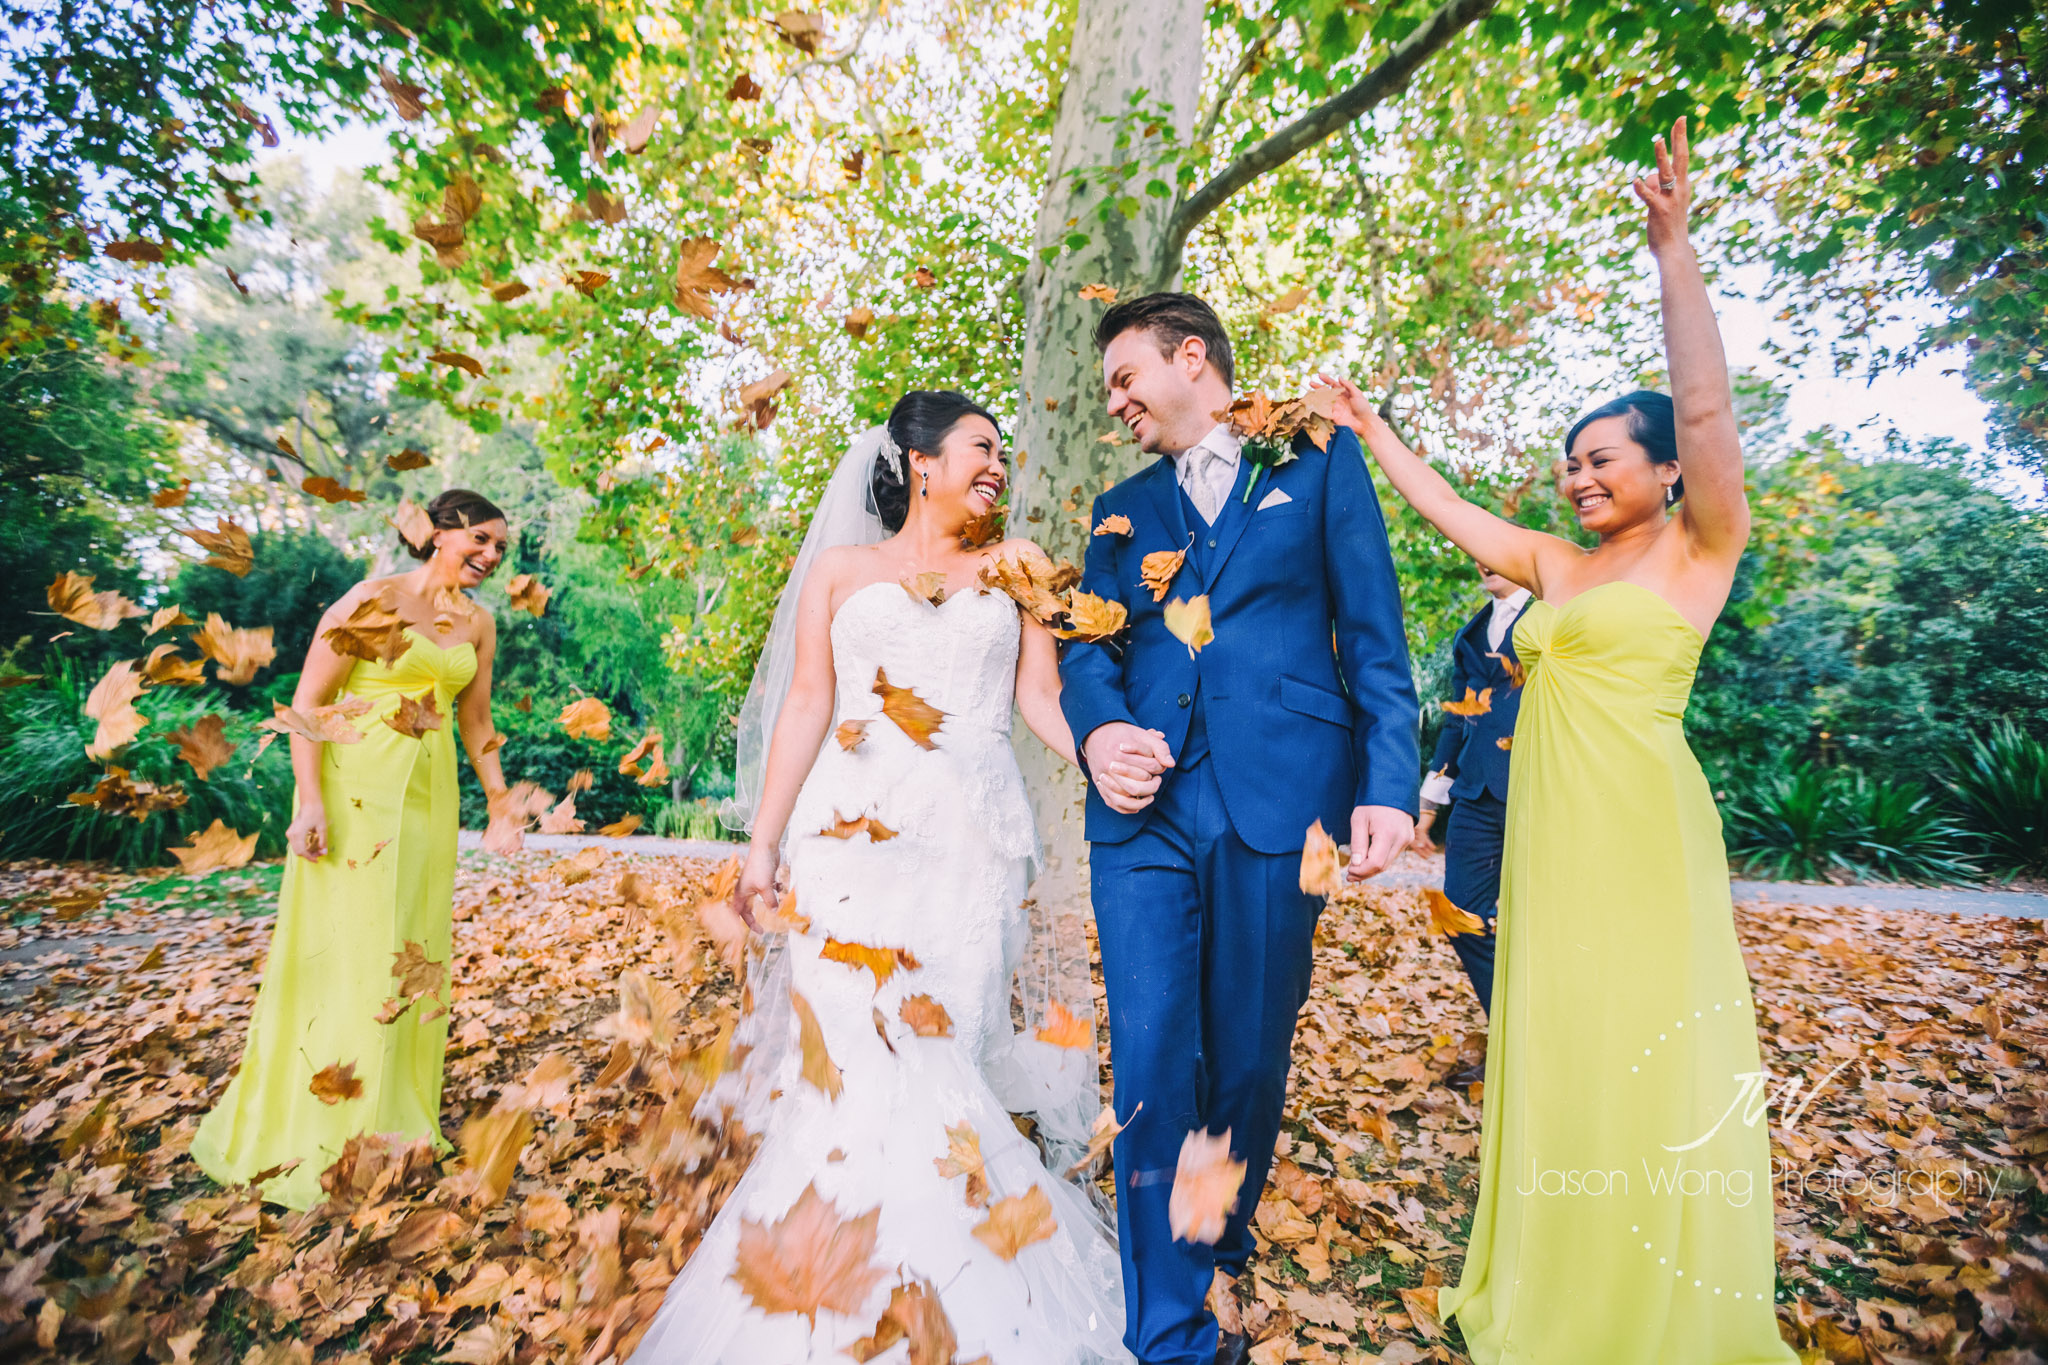 adelaide-wedding-autumn-leaf-having-fun.jpg